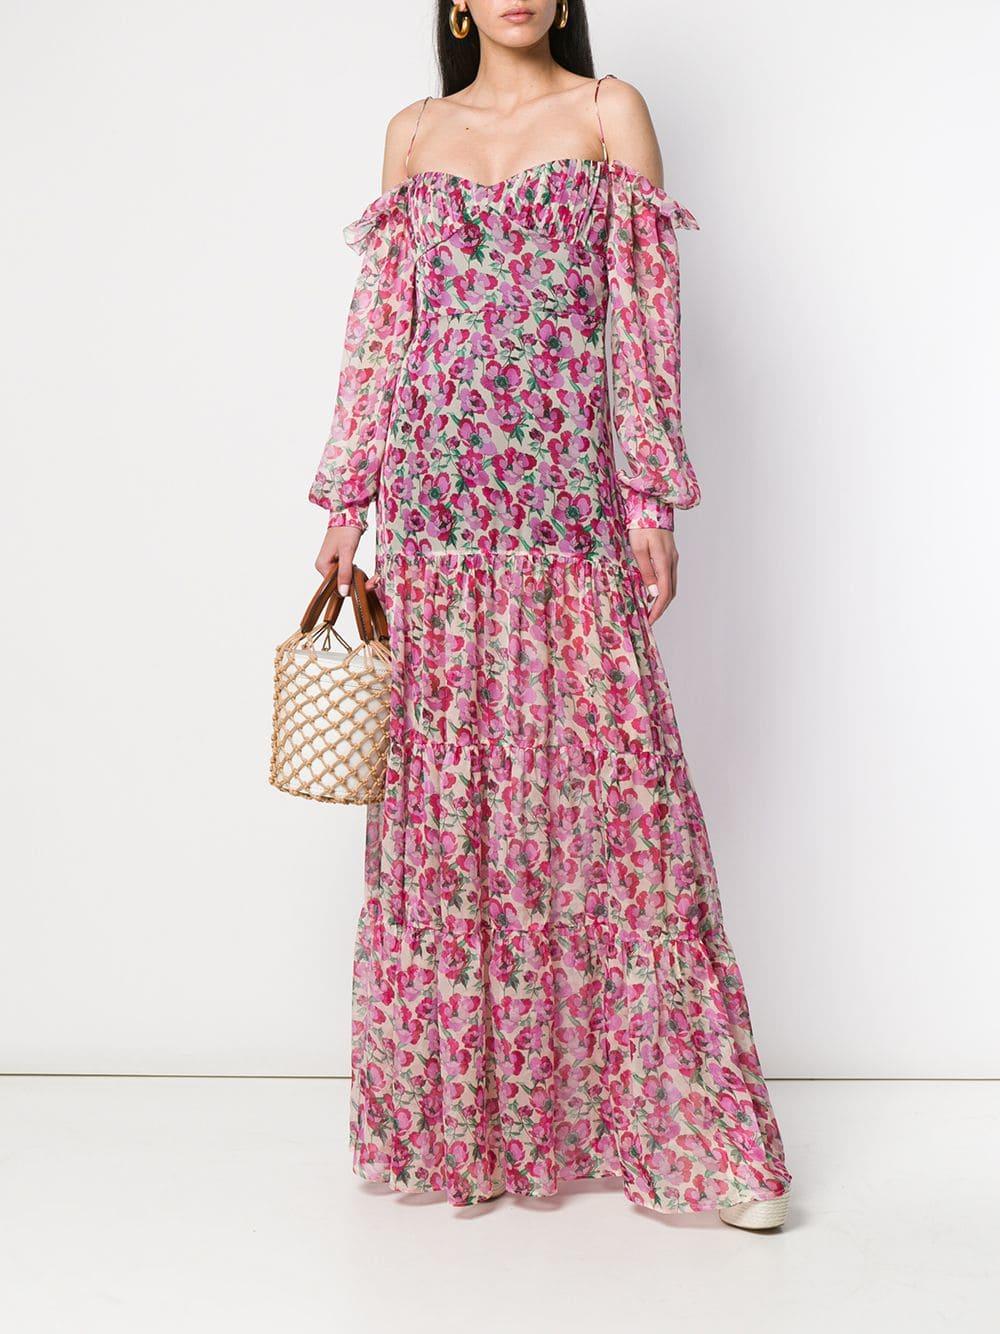 RAQUEL DINIZ Floral Print Pink Dress